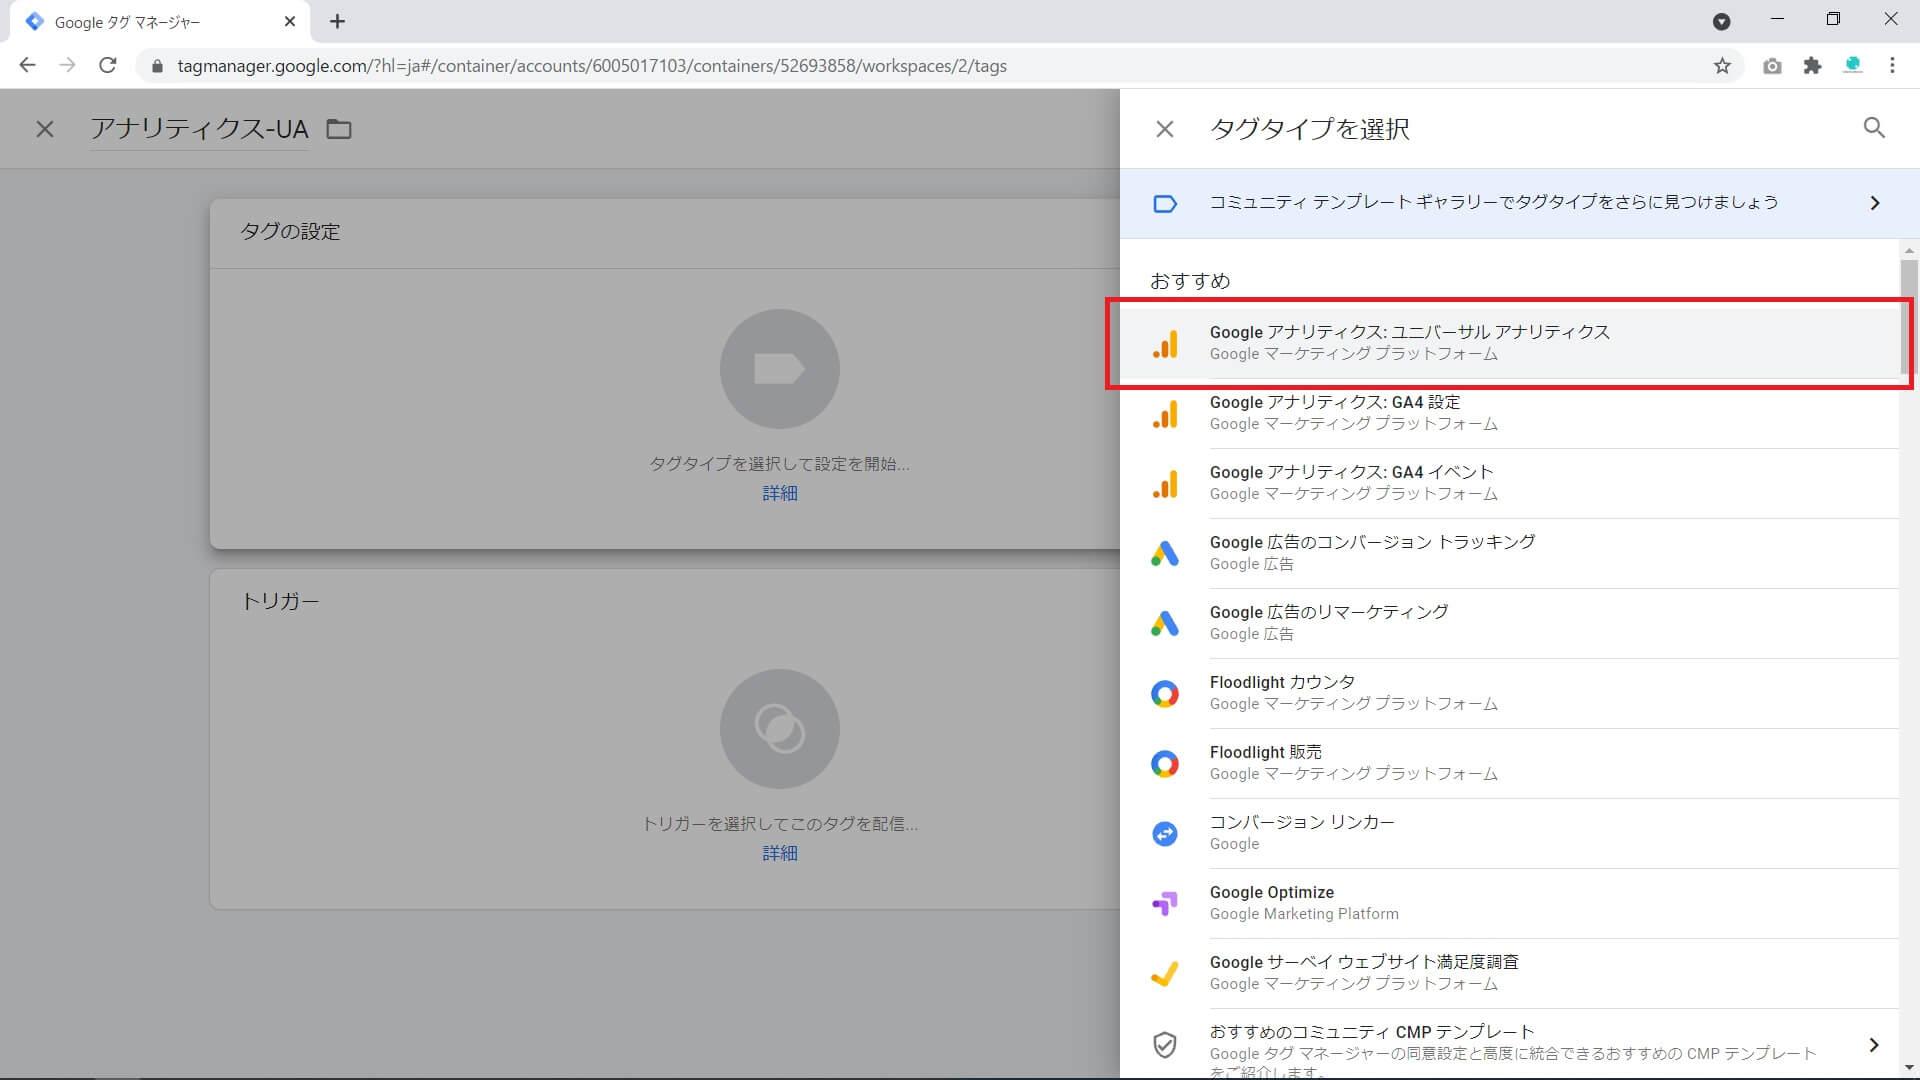 GTM-タグ設定-『Googleアナリティクス:ユニバーサルアナリティクス』を選択